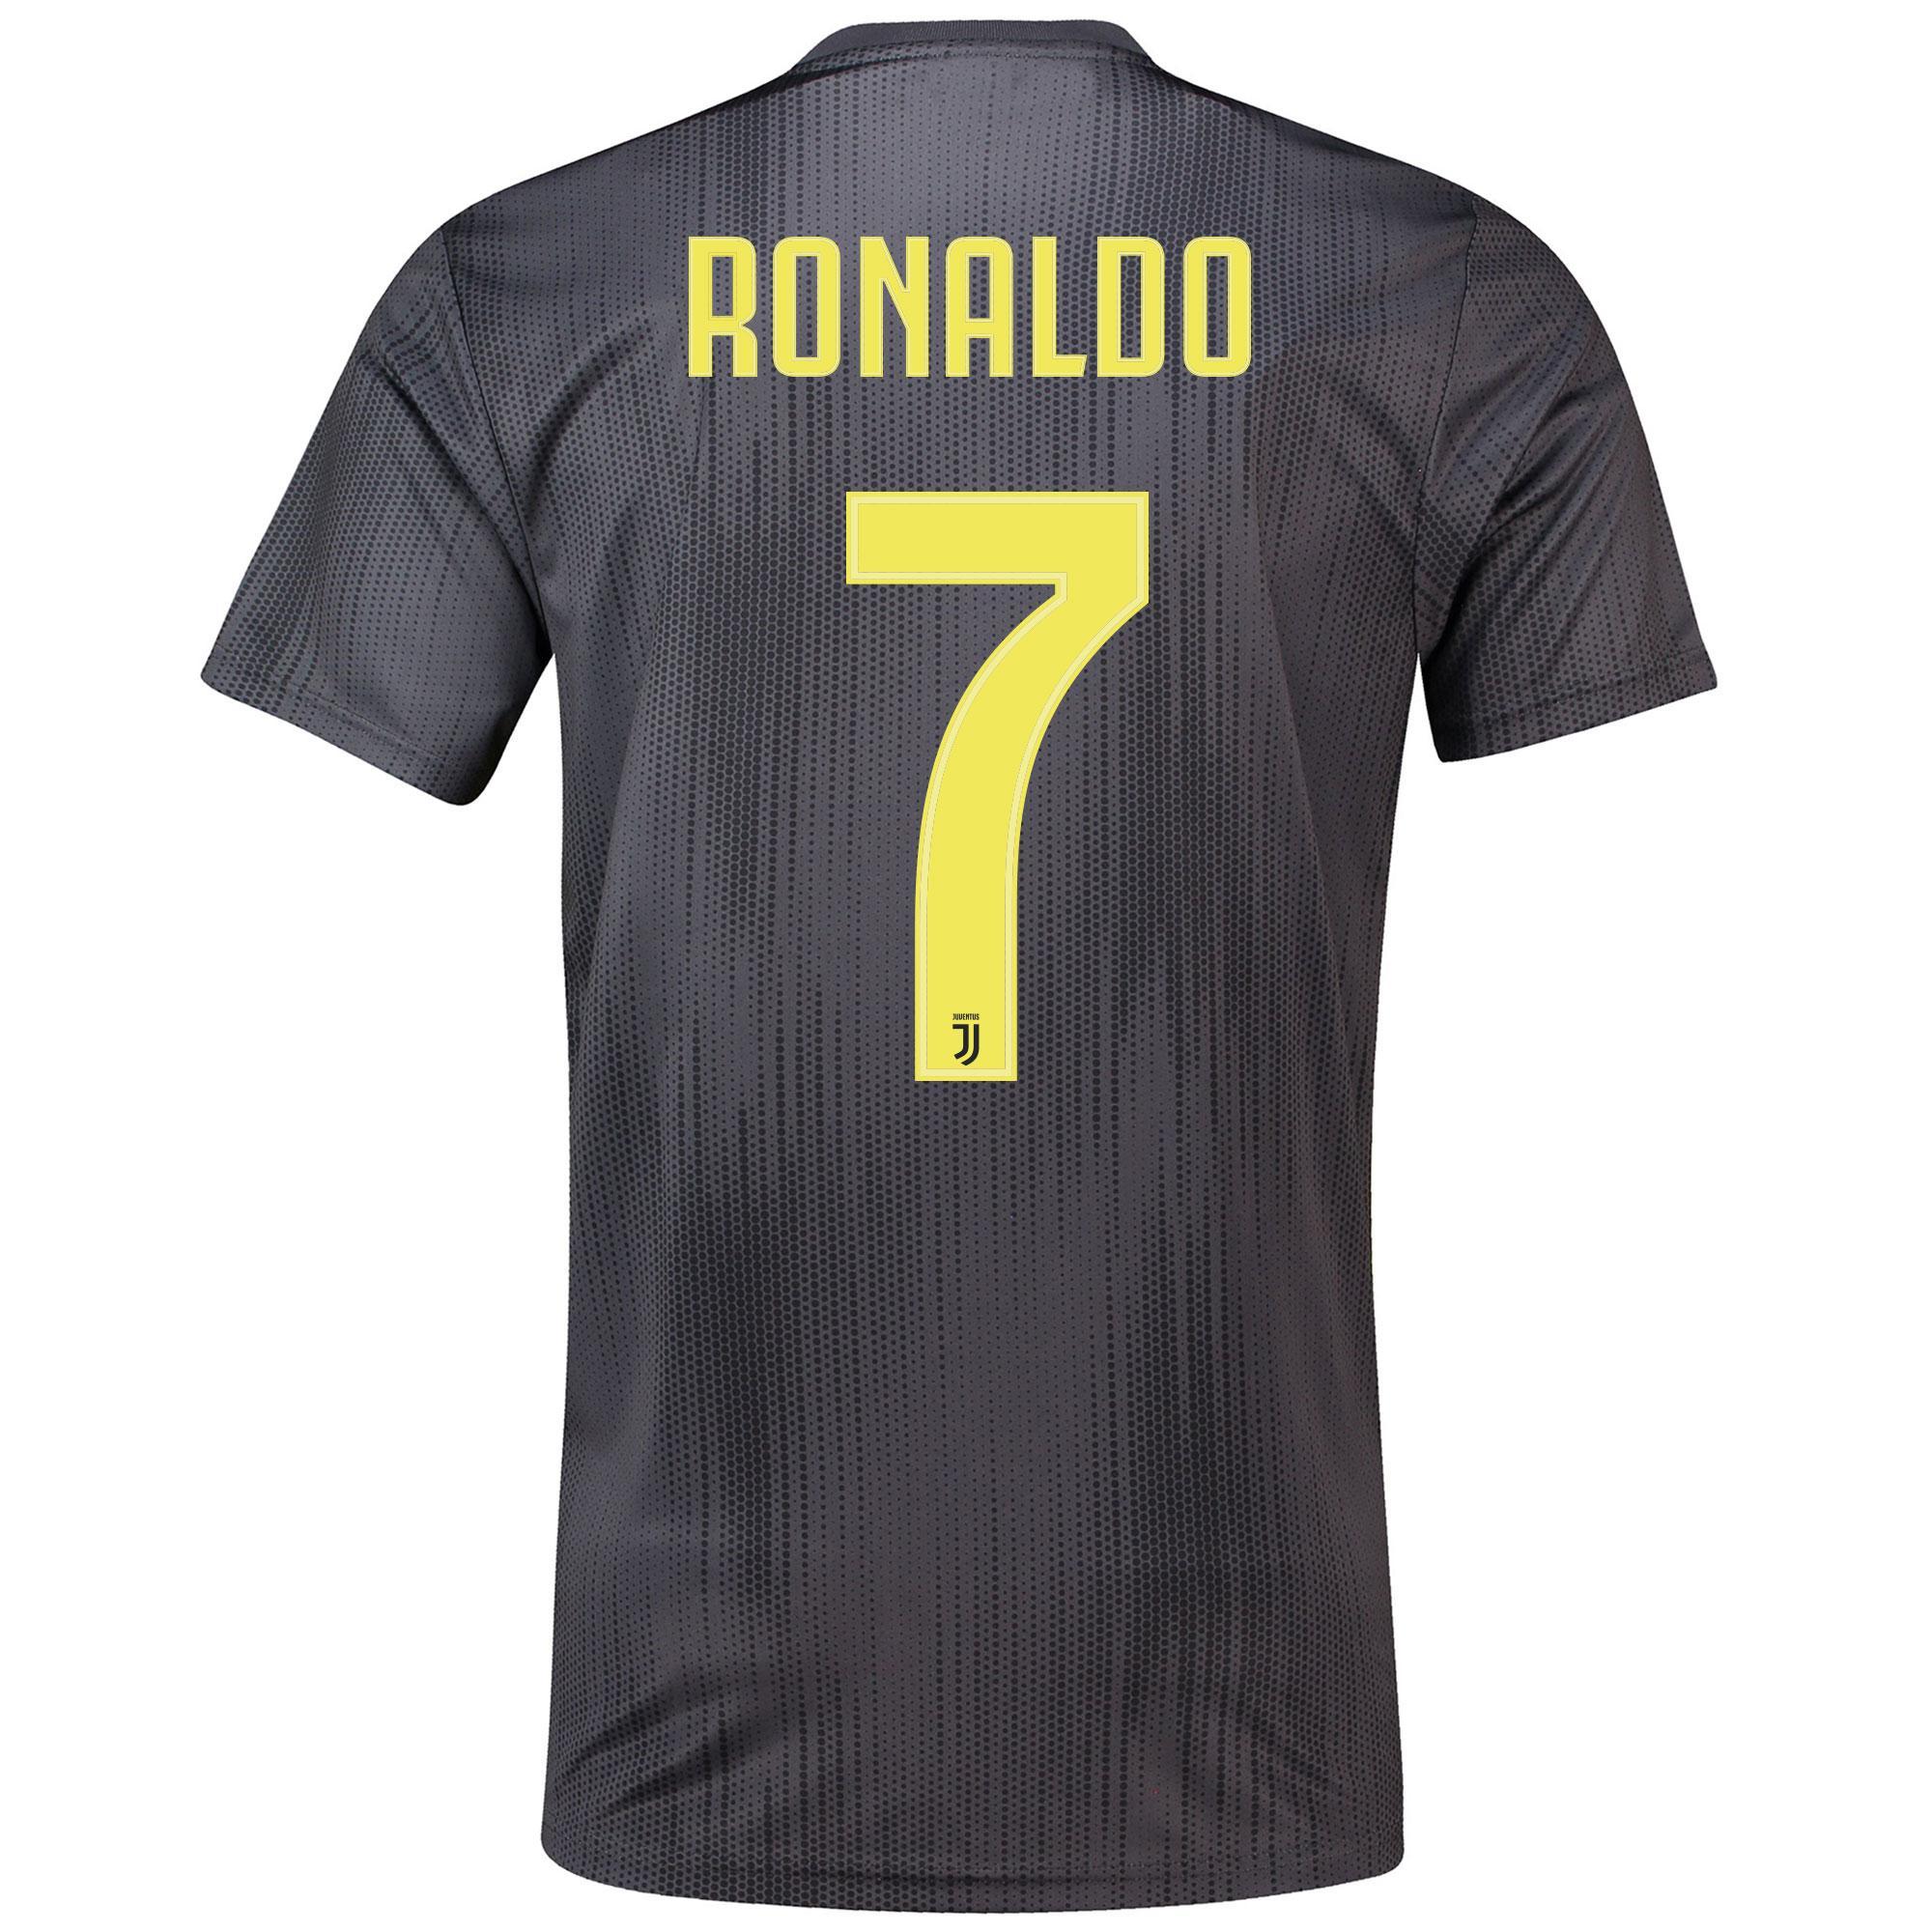 finest selection 80e87 457e8 Juventus Third Jersey Ronaldo Print